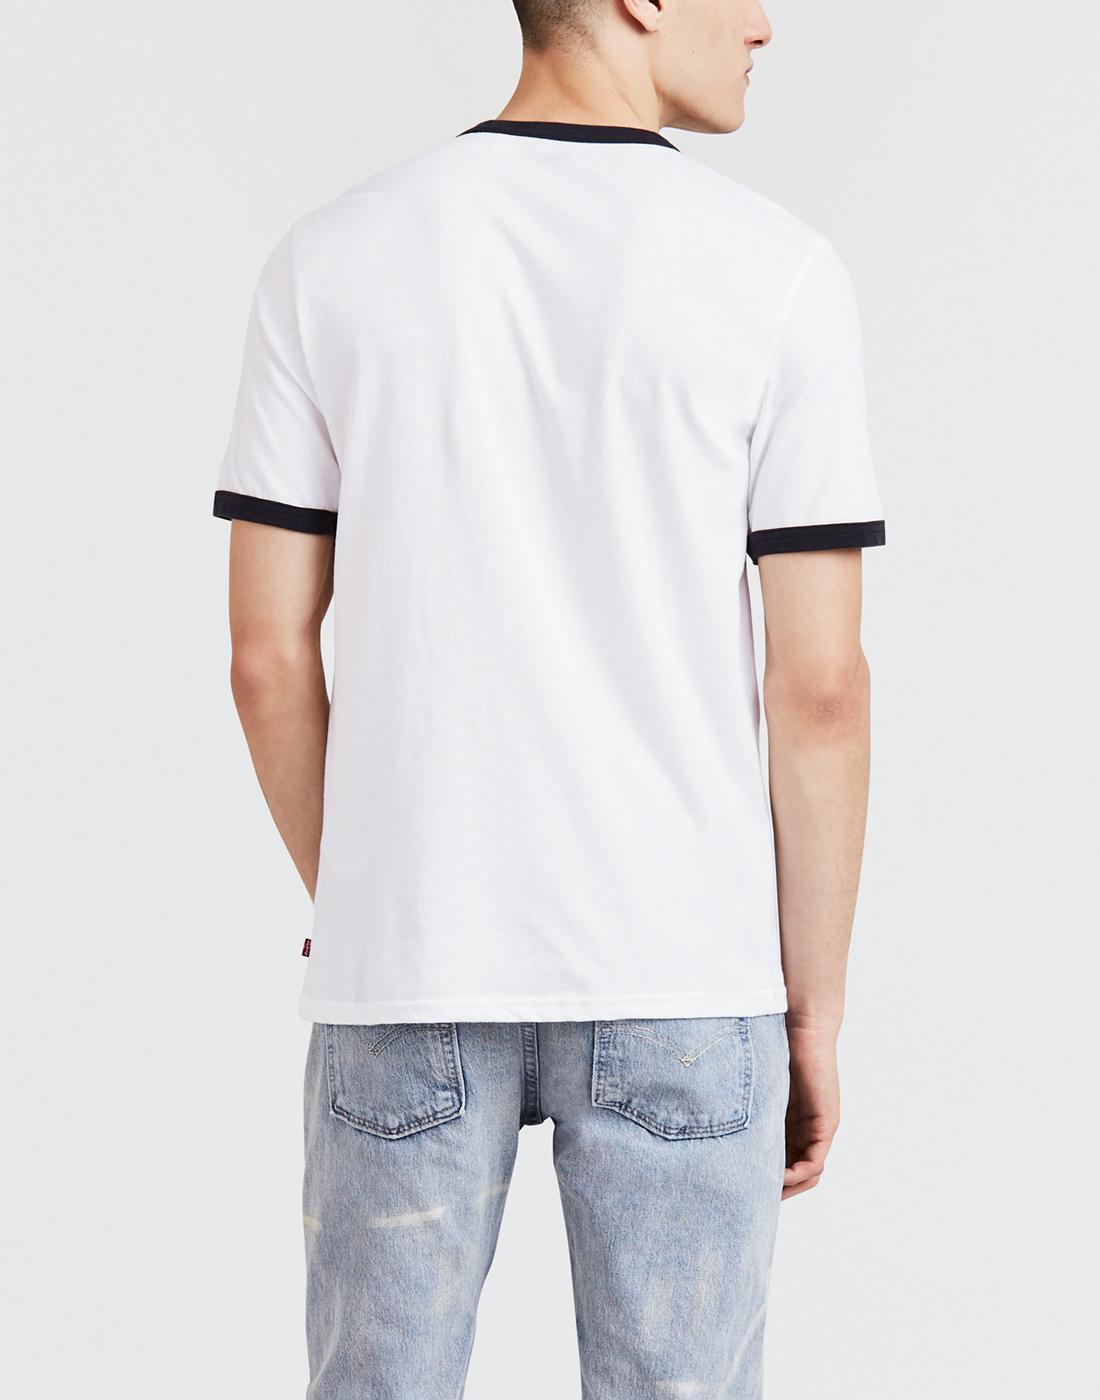 6824aa5dee7 LEVI'S Men's Retro 80s Vintage Sports Ringer T-Shirt in White